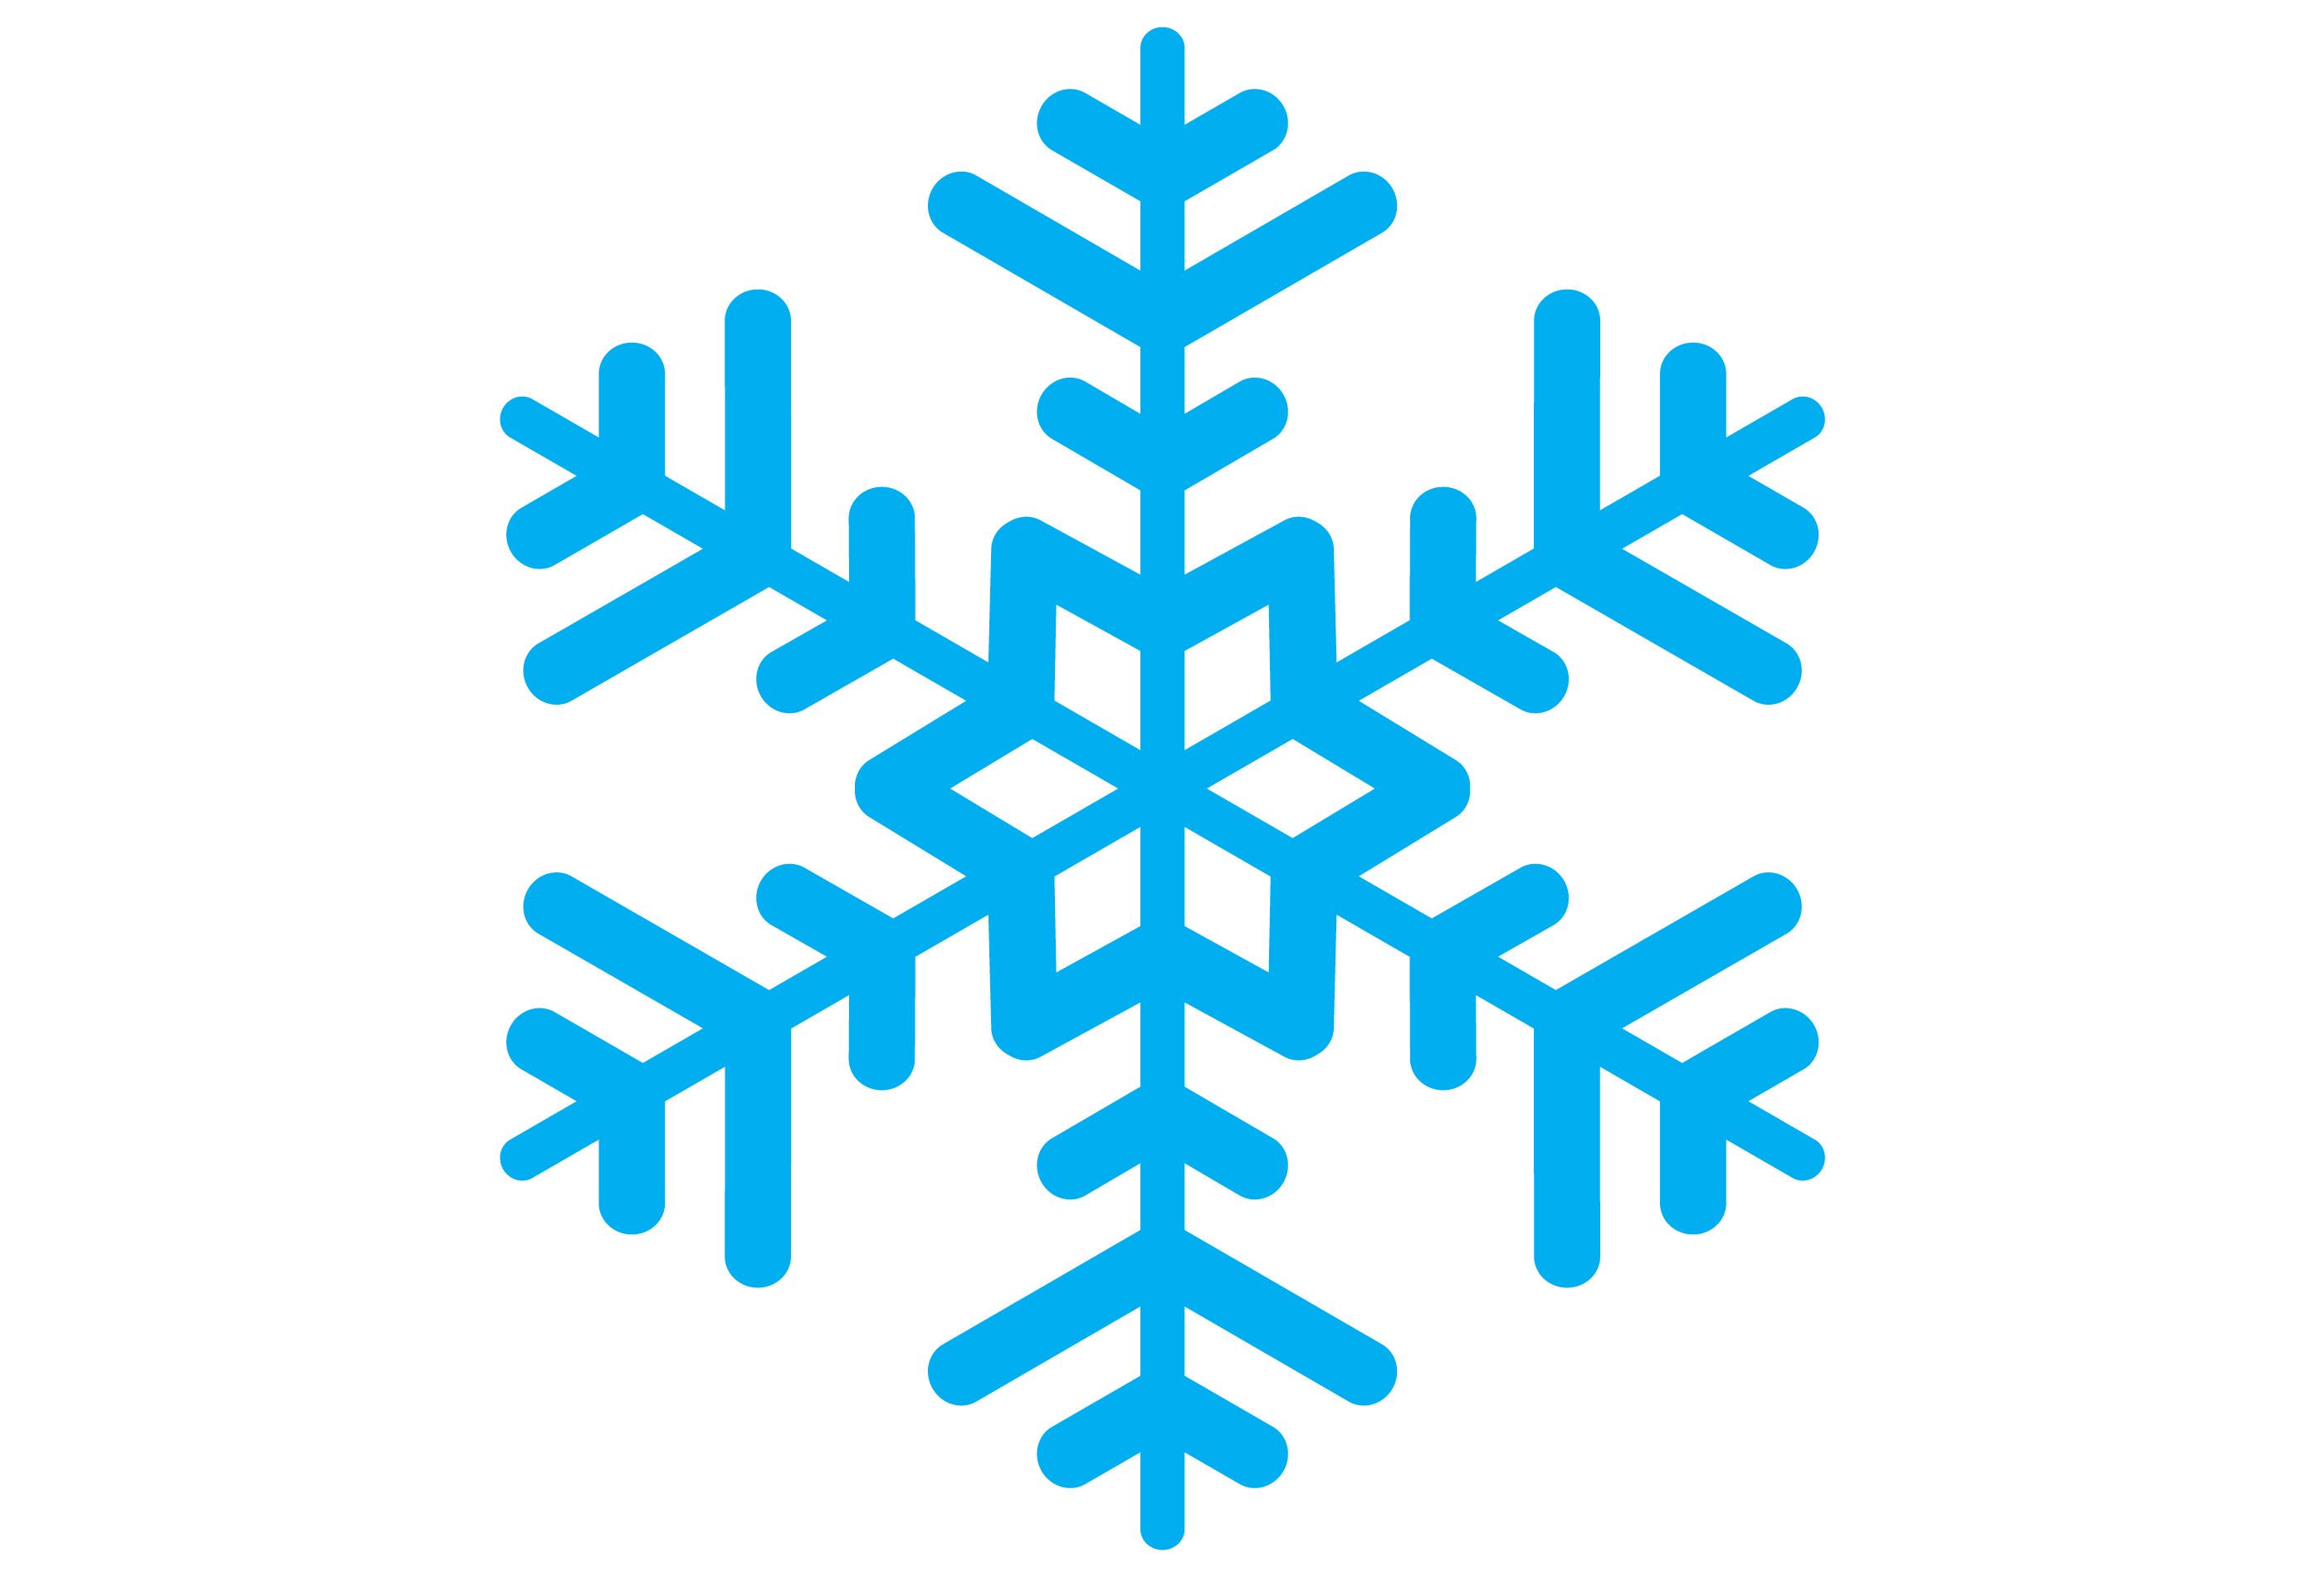 2800x1900 Clipart Snowflake